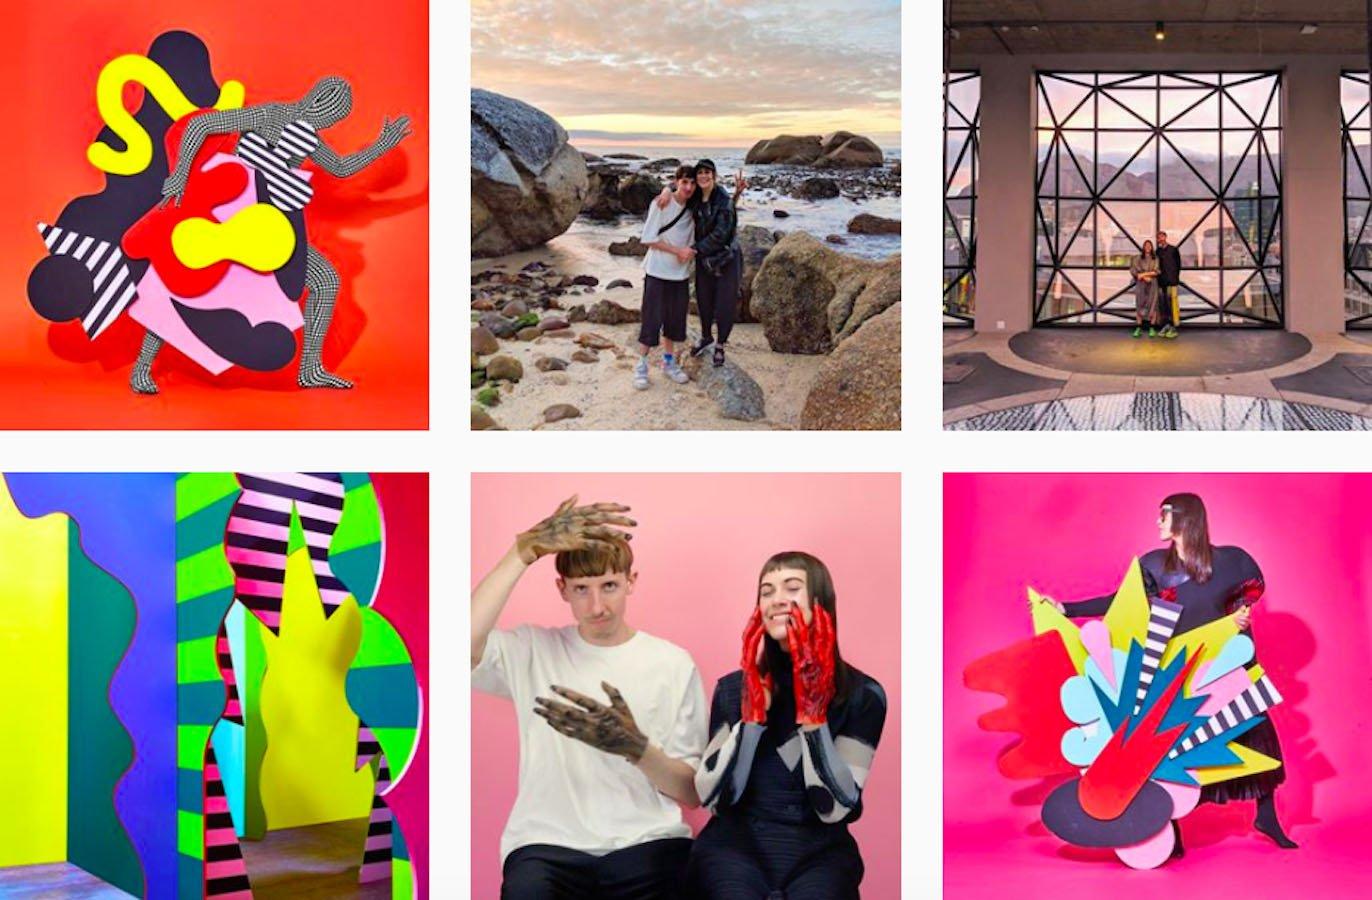 Web Design Inspiration: 110+ Accounts On Instagram and 10+ Best UX & Web Design Books in 2020 - letasobierajski